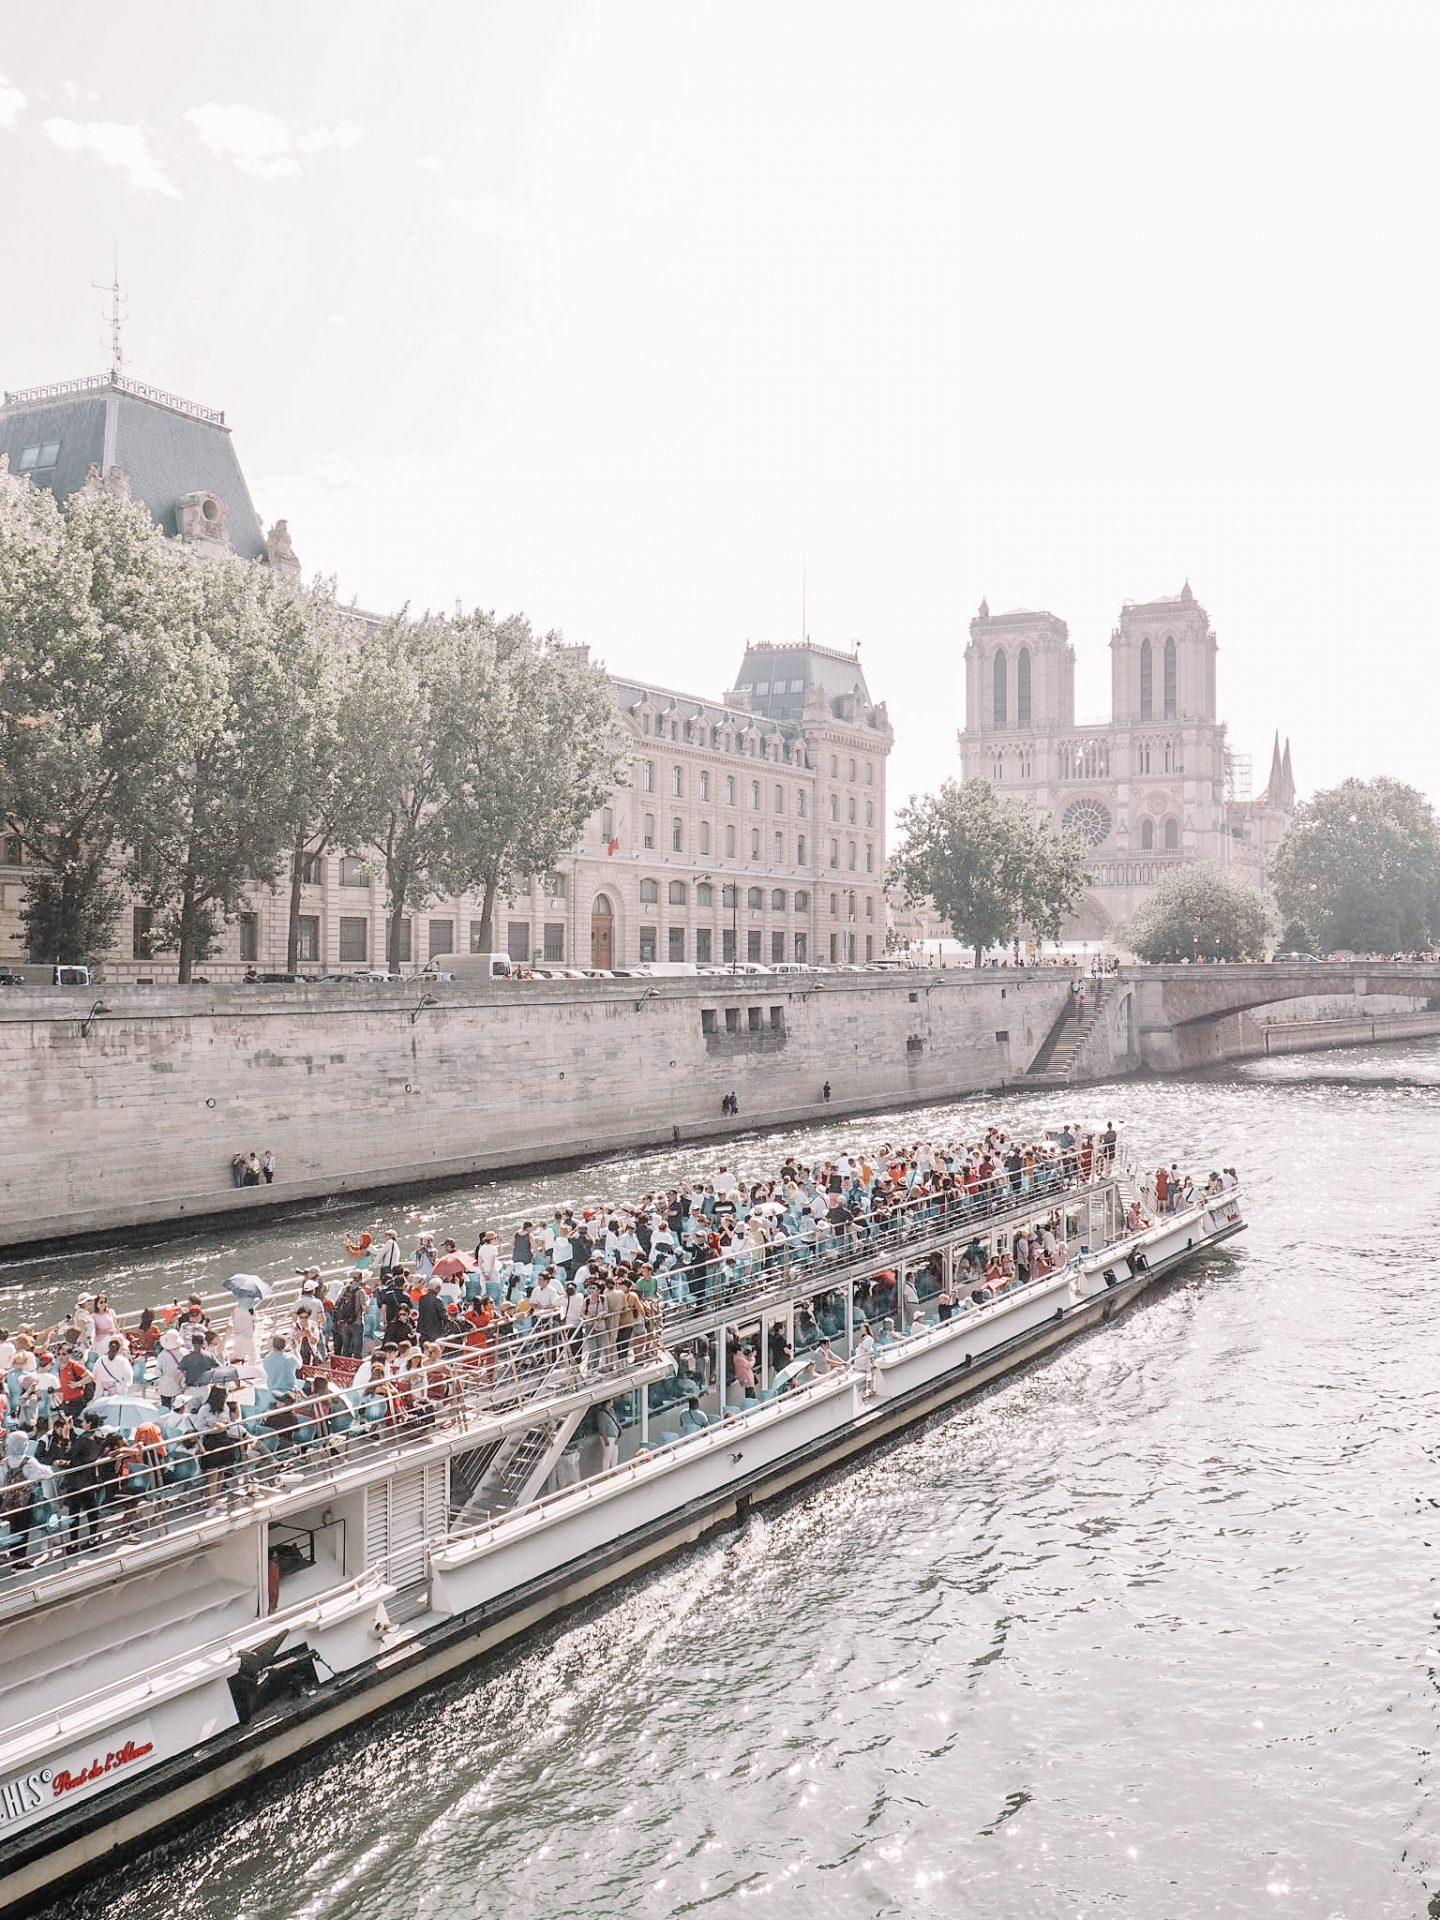 Wanderlust - A Trip to Paris